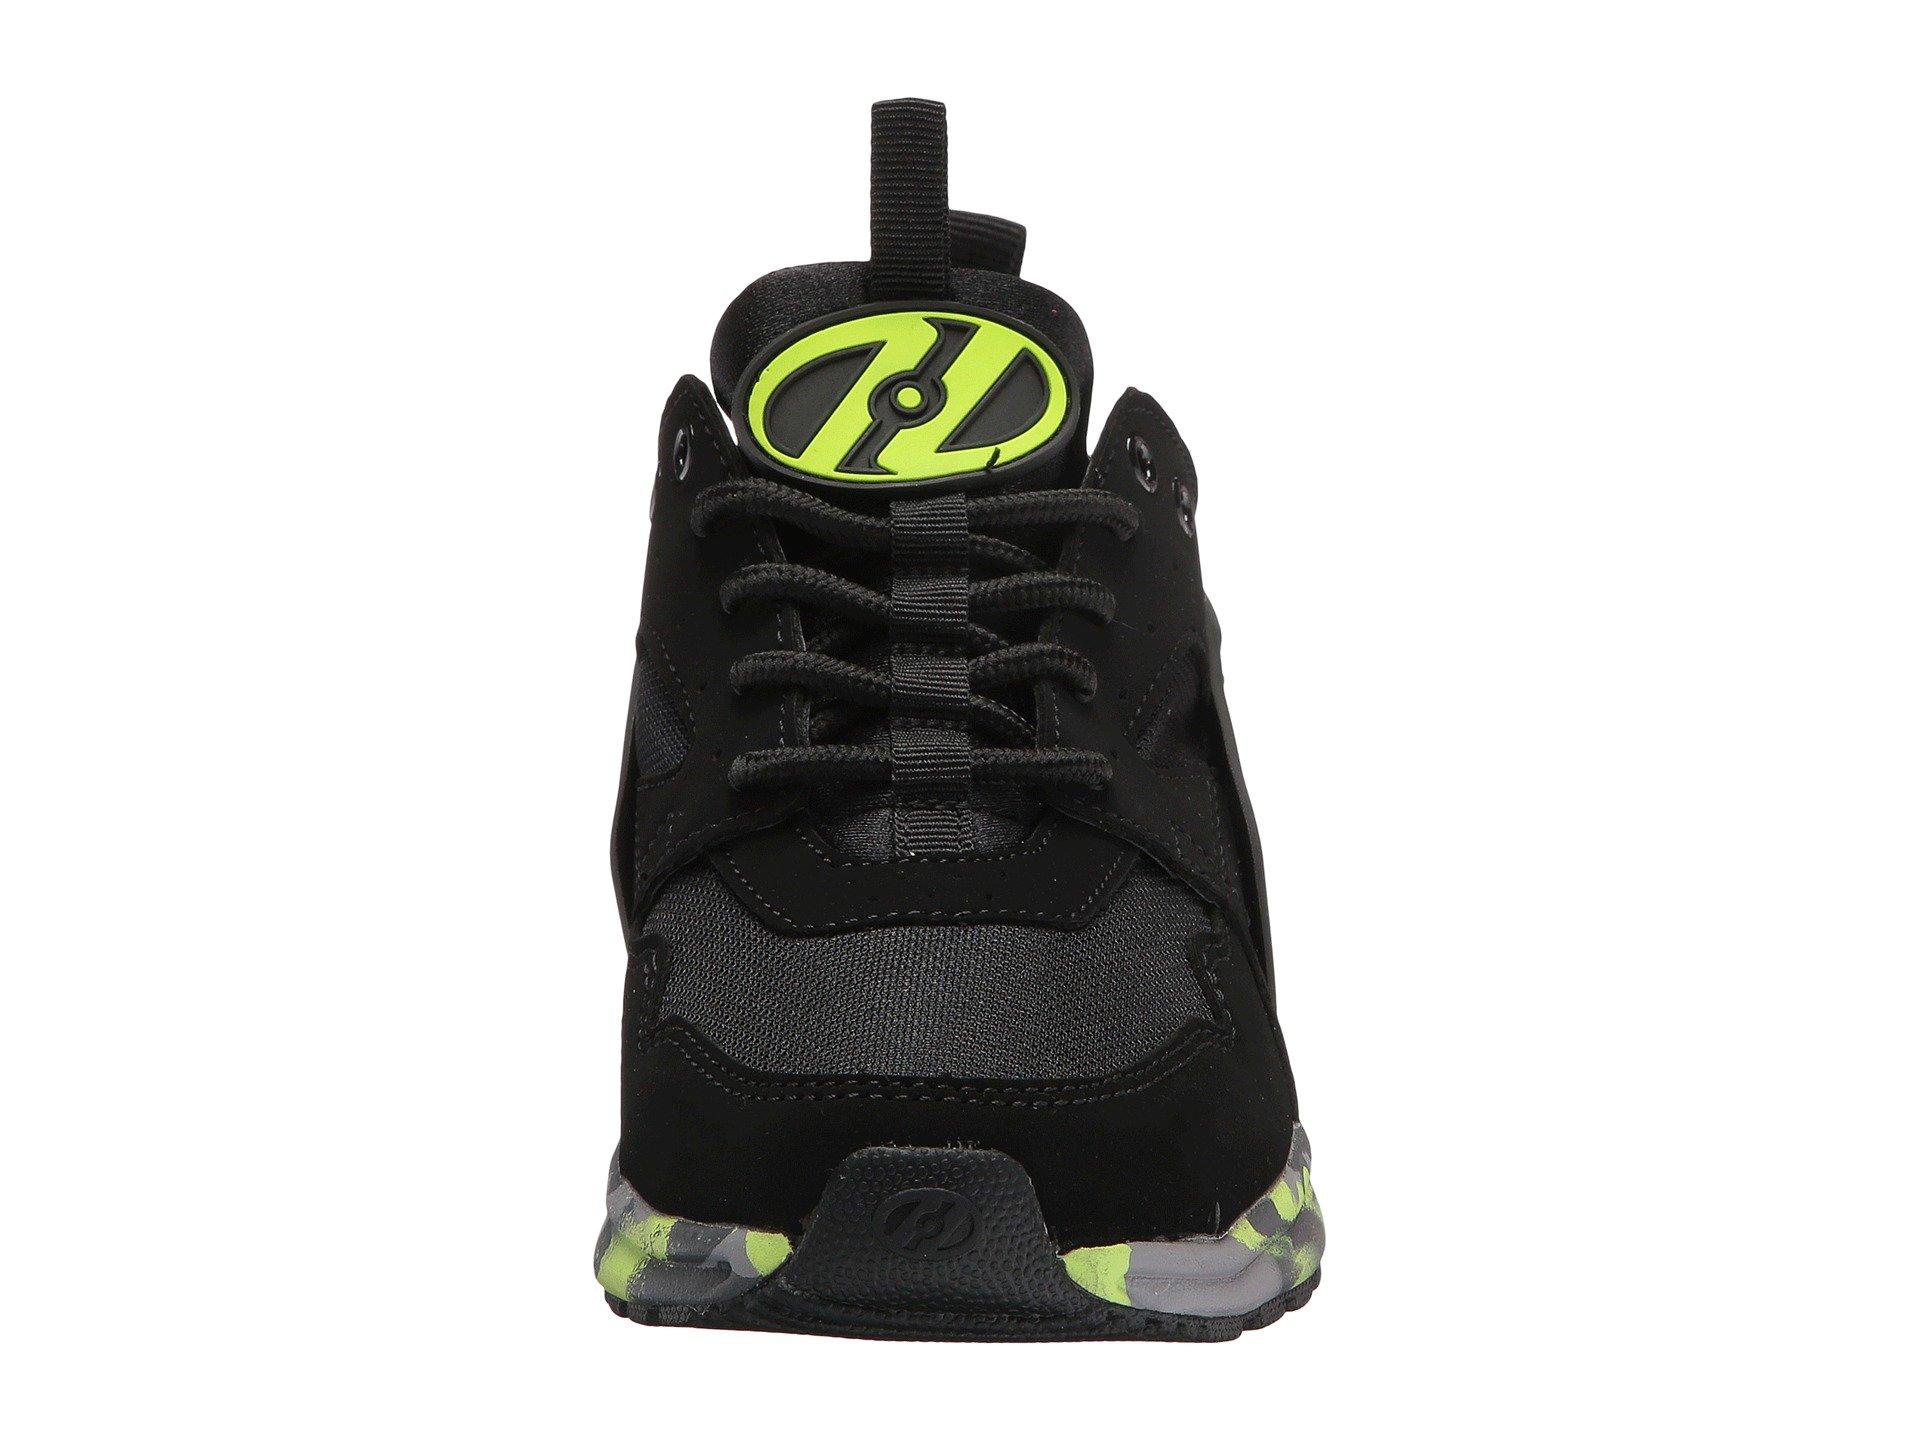 Heelys HE100095H Kid's Force Sneakers, Black/Brightyellow/Confet - 8 by Heelys (Image #5)